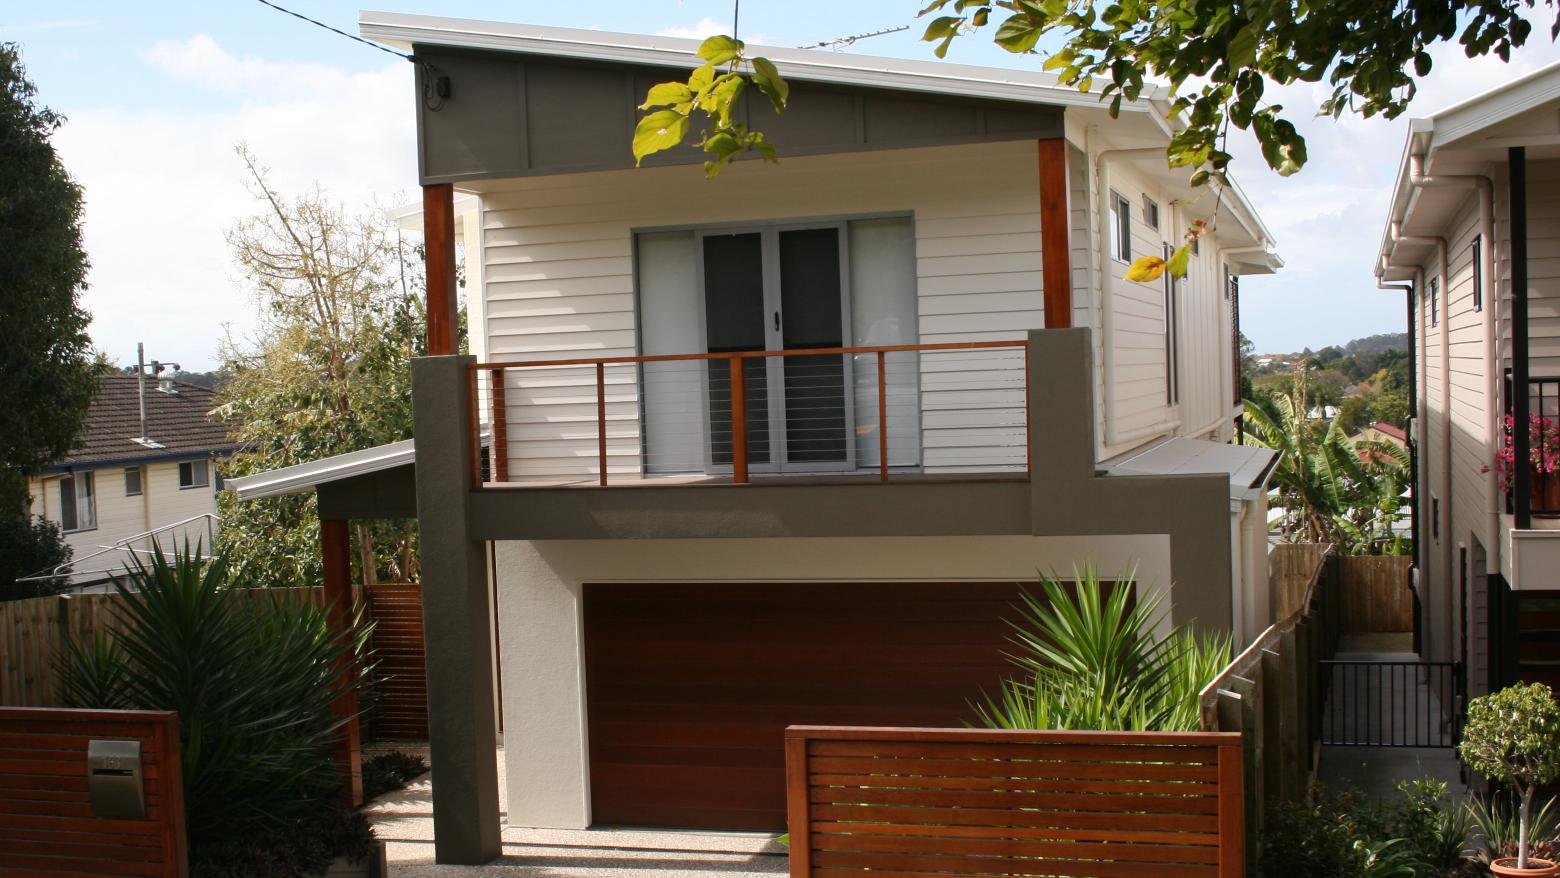 Alan Brind Design  CAD Drafting About Us - House design with garage underneath